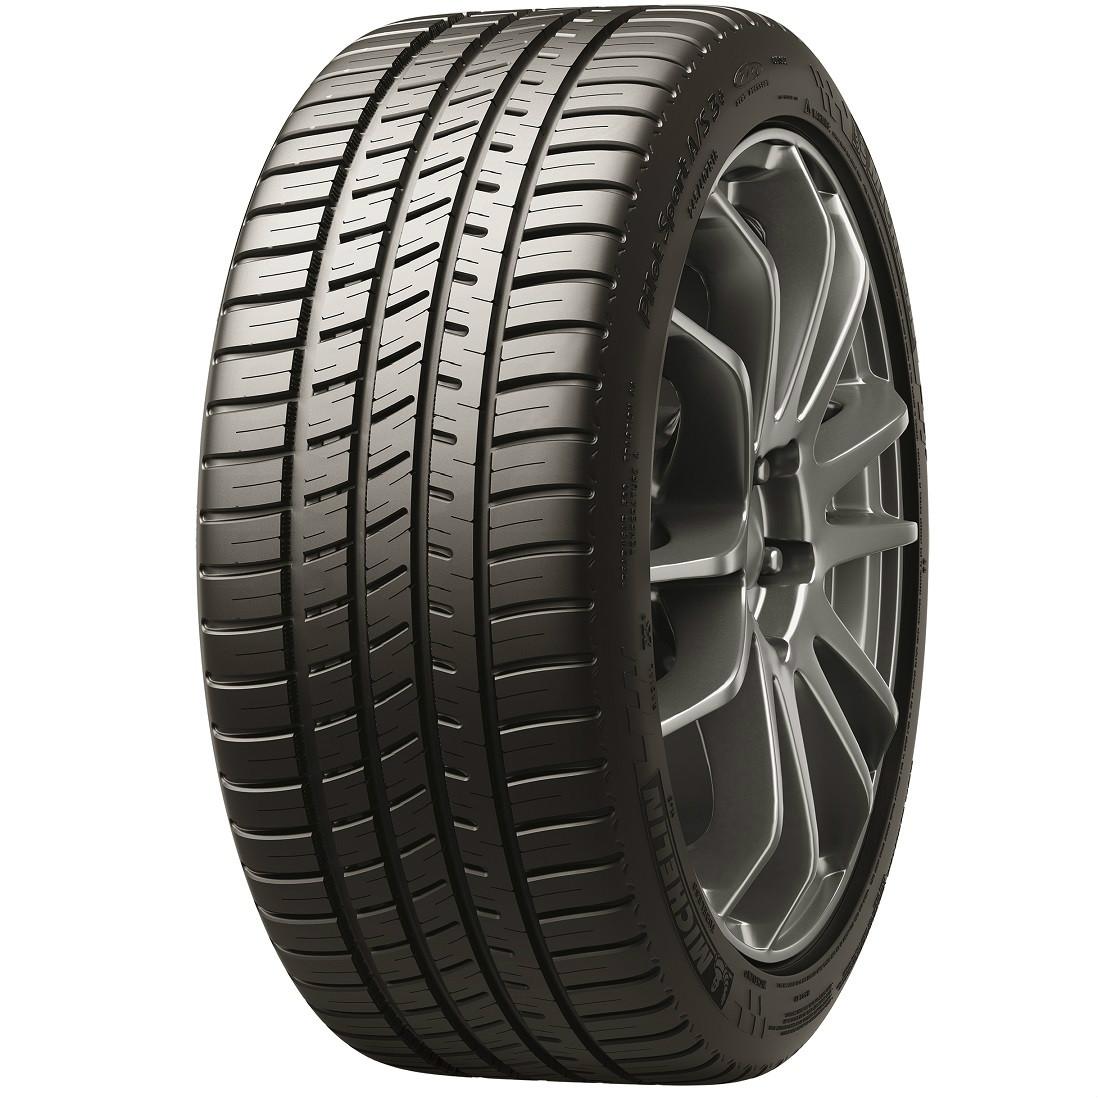 1 michelin pilot sport a s 3 tire s 245 45r20 103y xl 2454520 245 45 20 r20 ebay. Black Bedroom Furniture Sets. Home Design Ideas